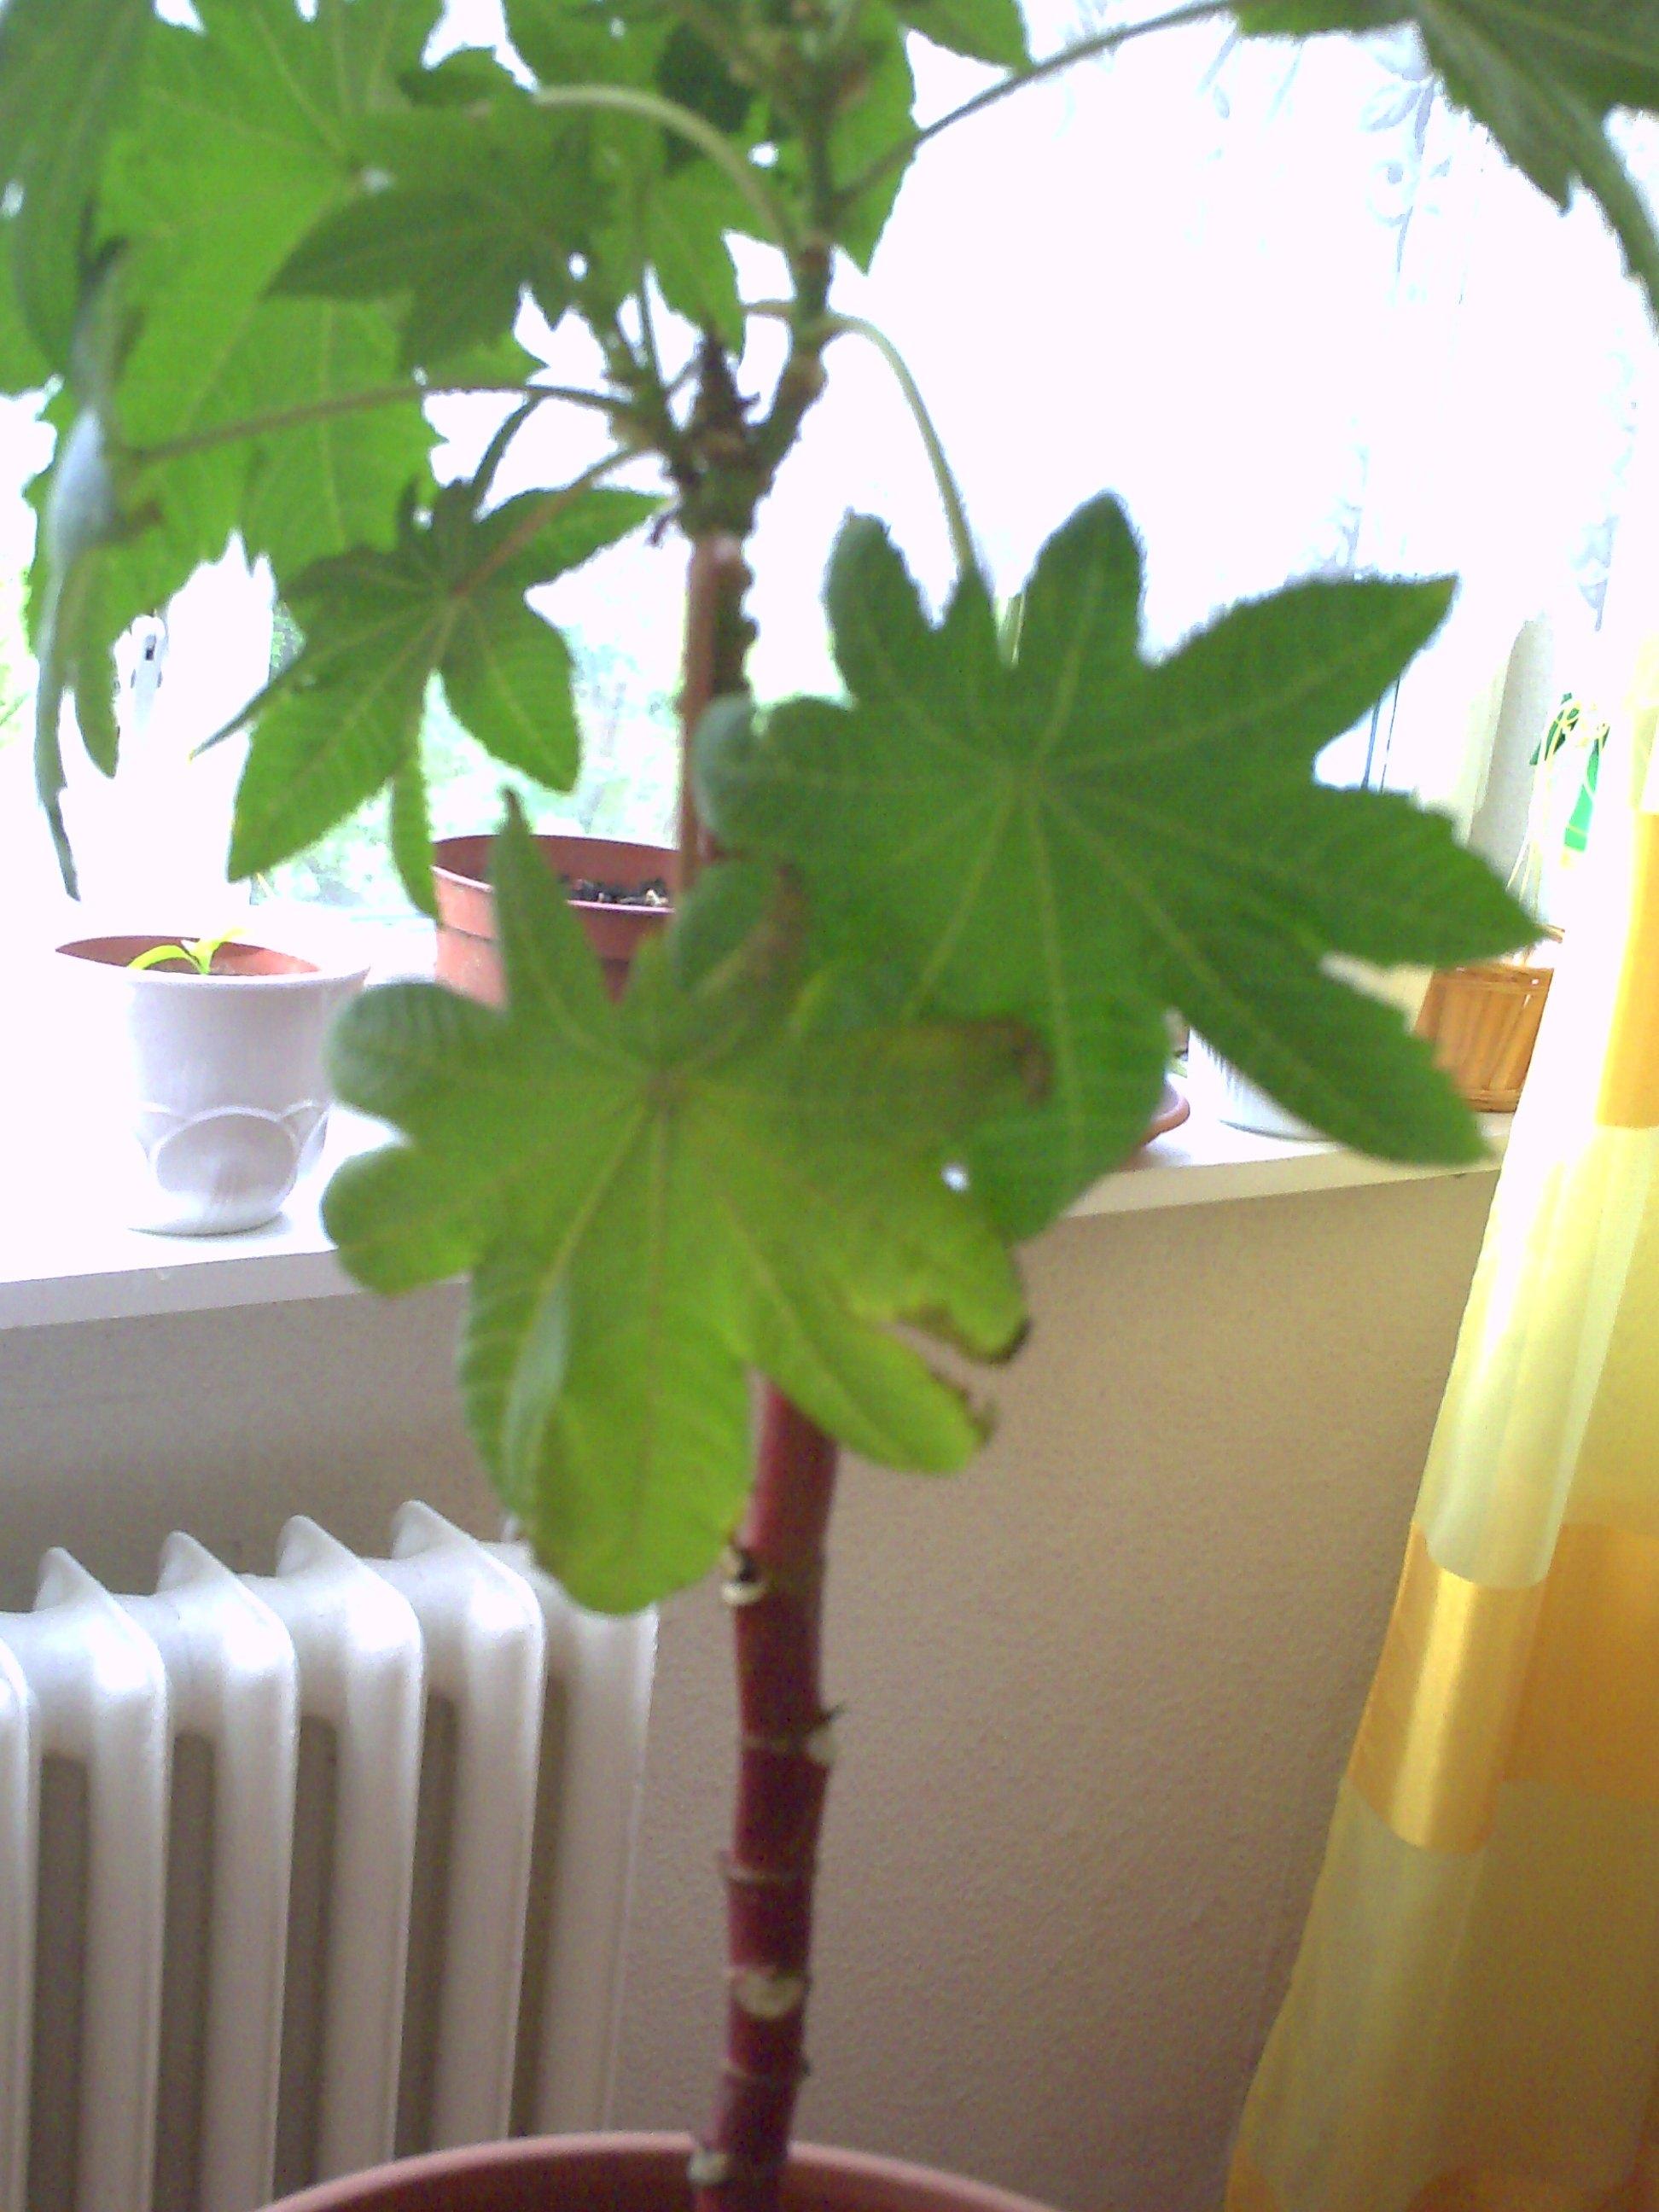 rizinuspflanze vom vorjahr gerettet jetzt fallen bl tter. Black Bedroom Furniture Sets. Home Design Ideas